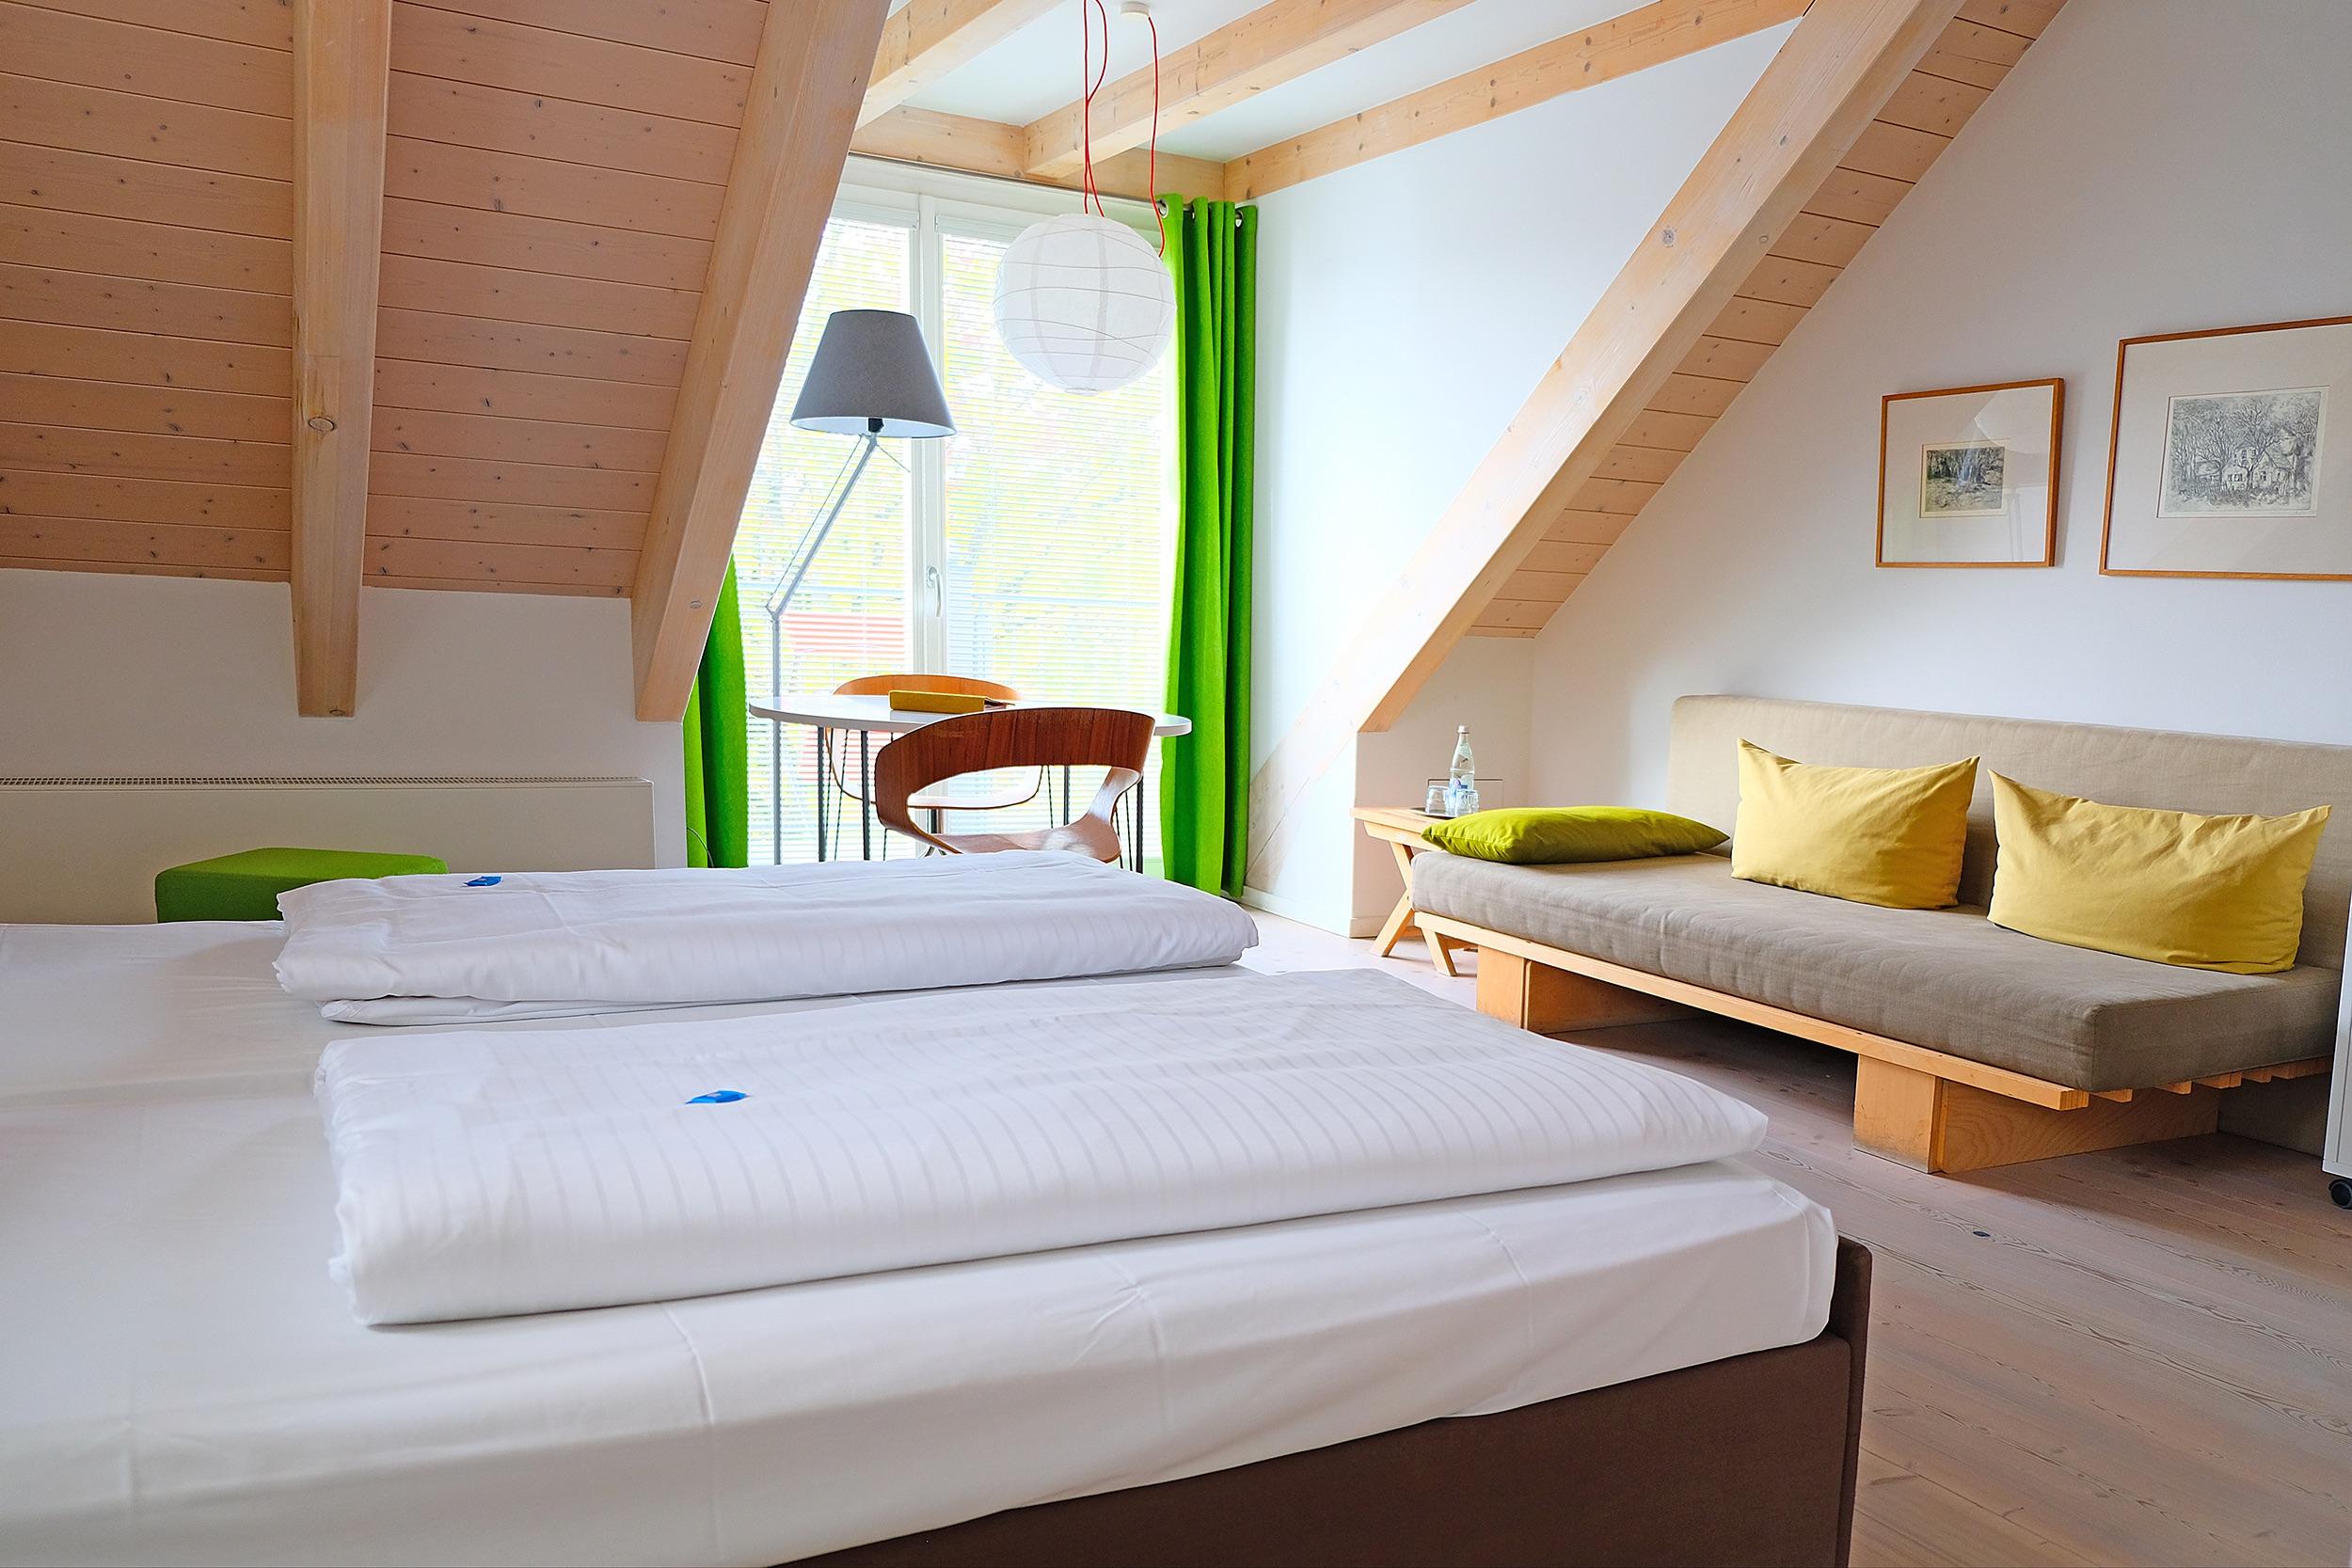 Doppelzimmer Goldfuchs mit Balkon im Fuchsbräu